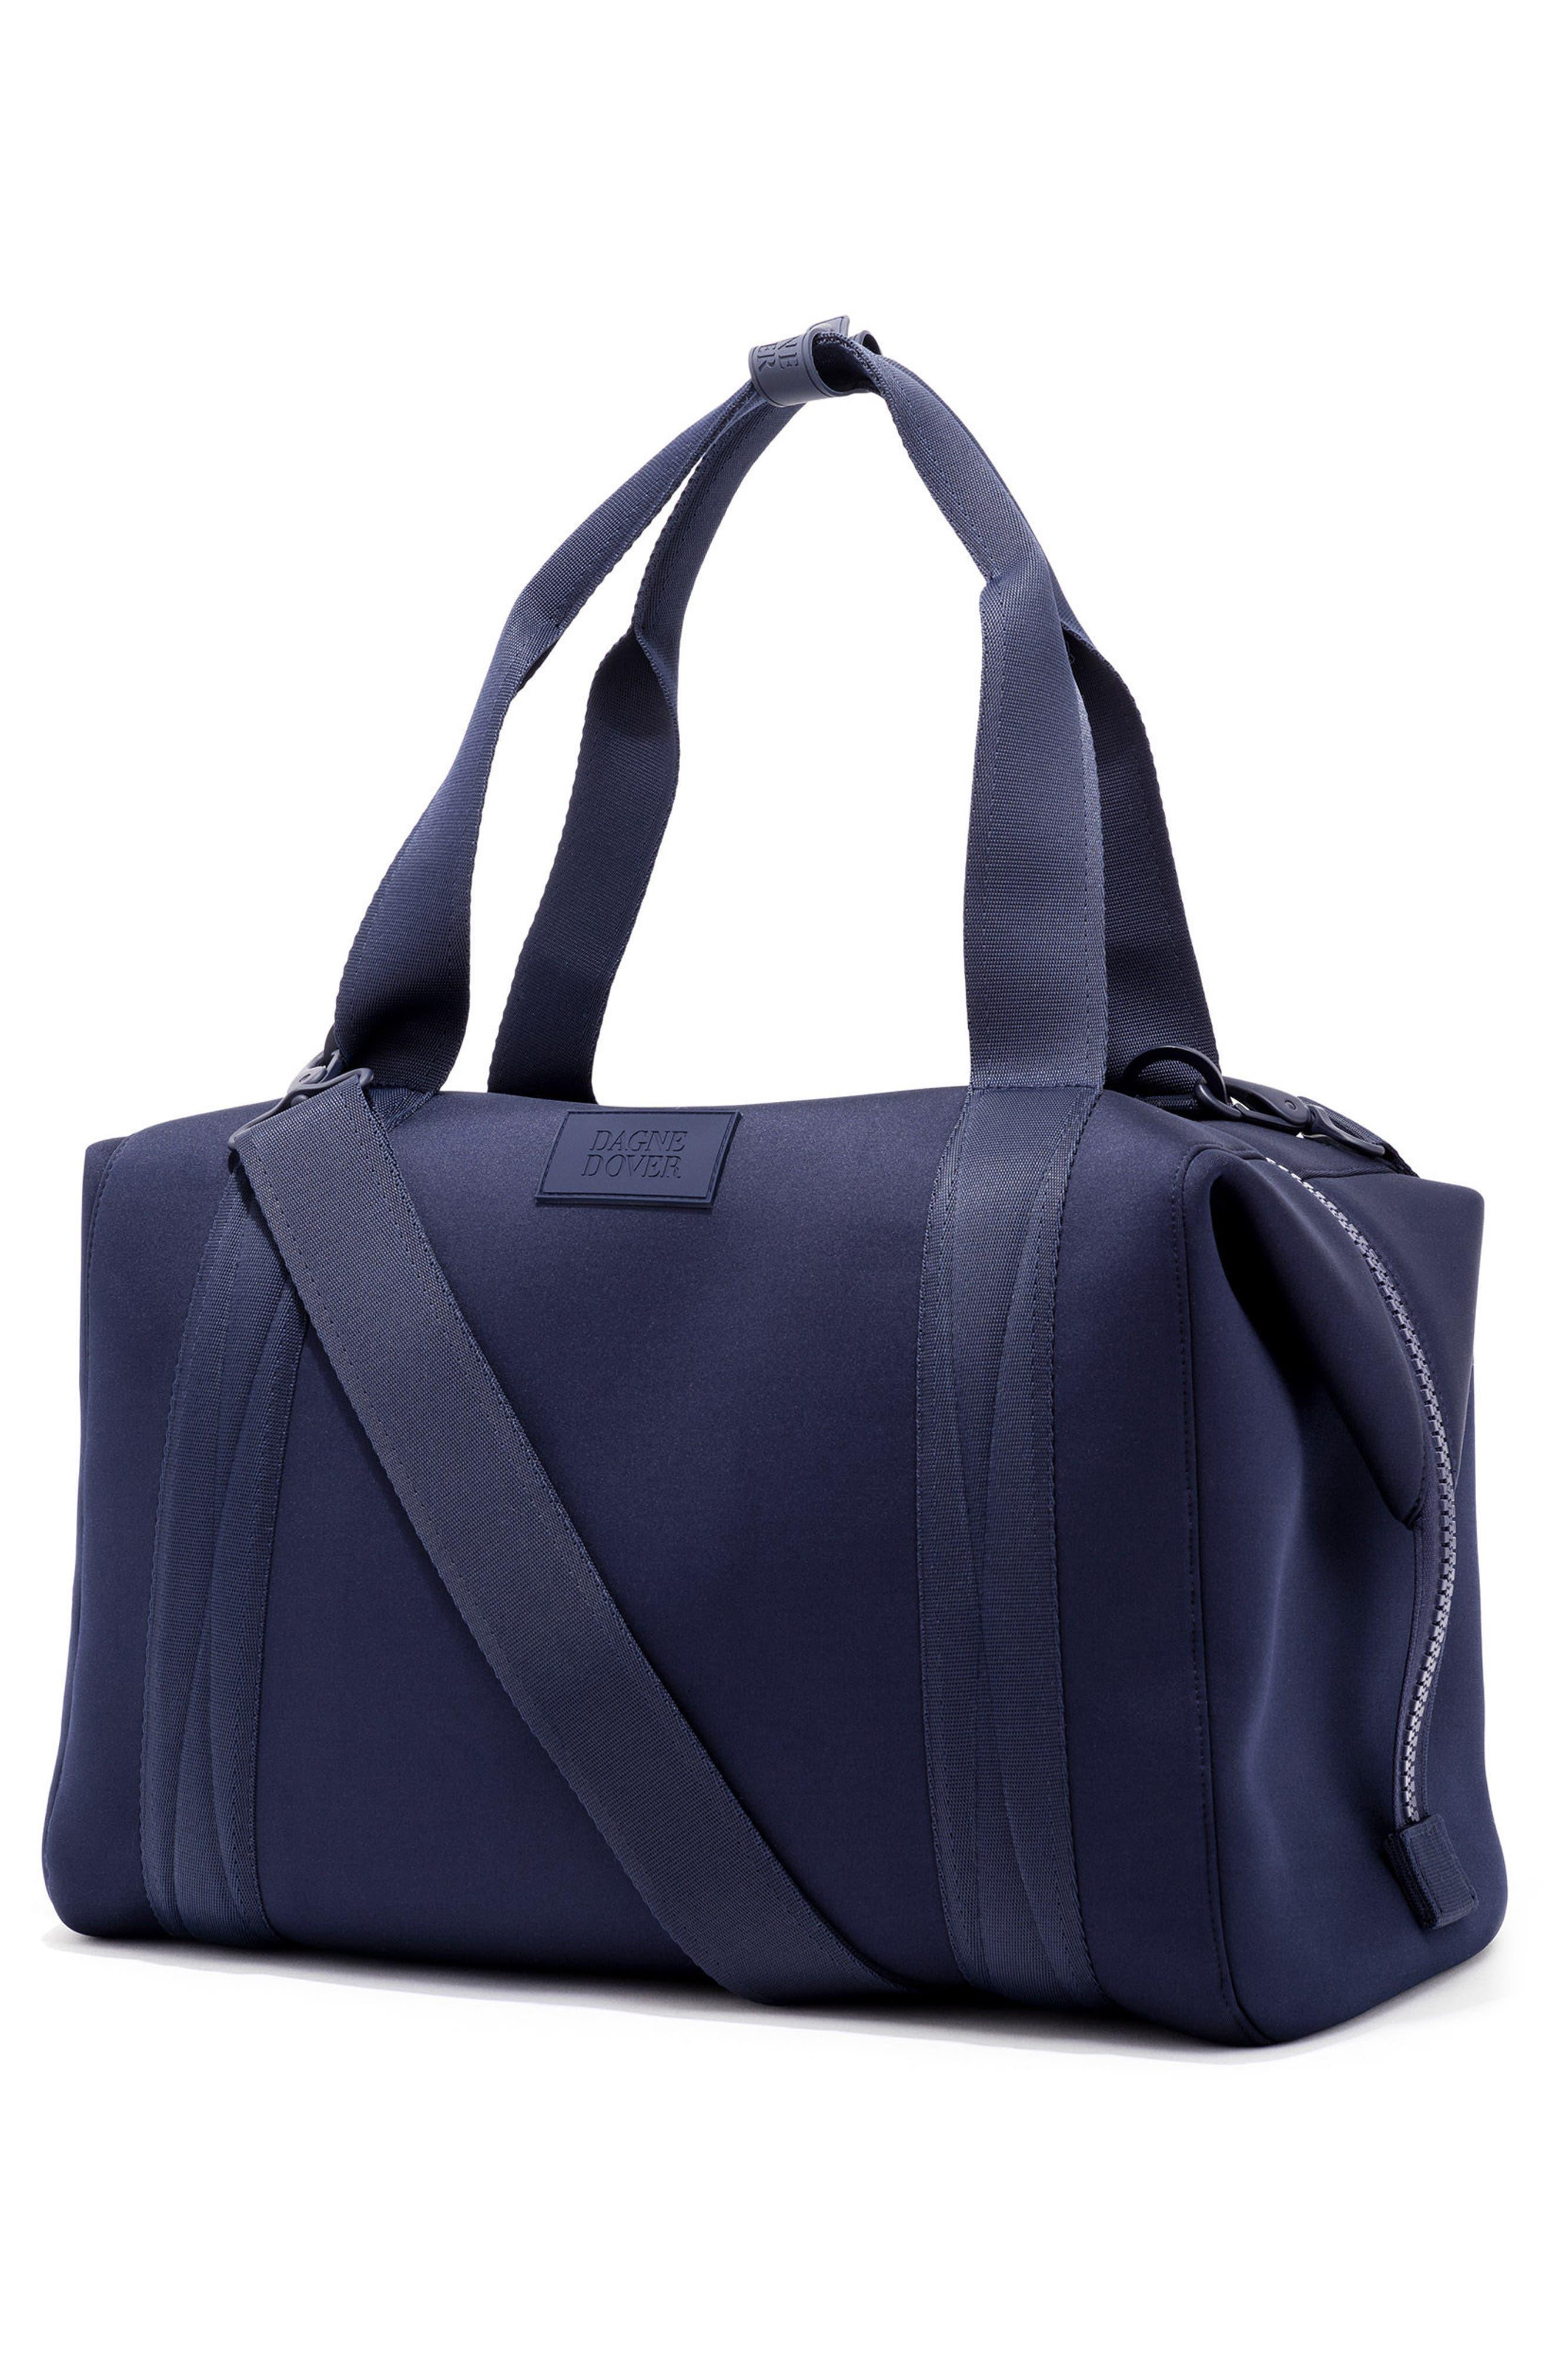 365 Large Landon Neoprene Carryall Duffel Bag,                             Alternate thumbnail 32, color,